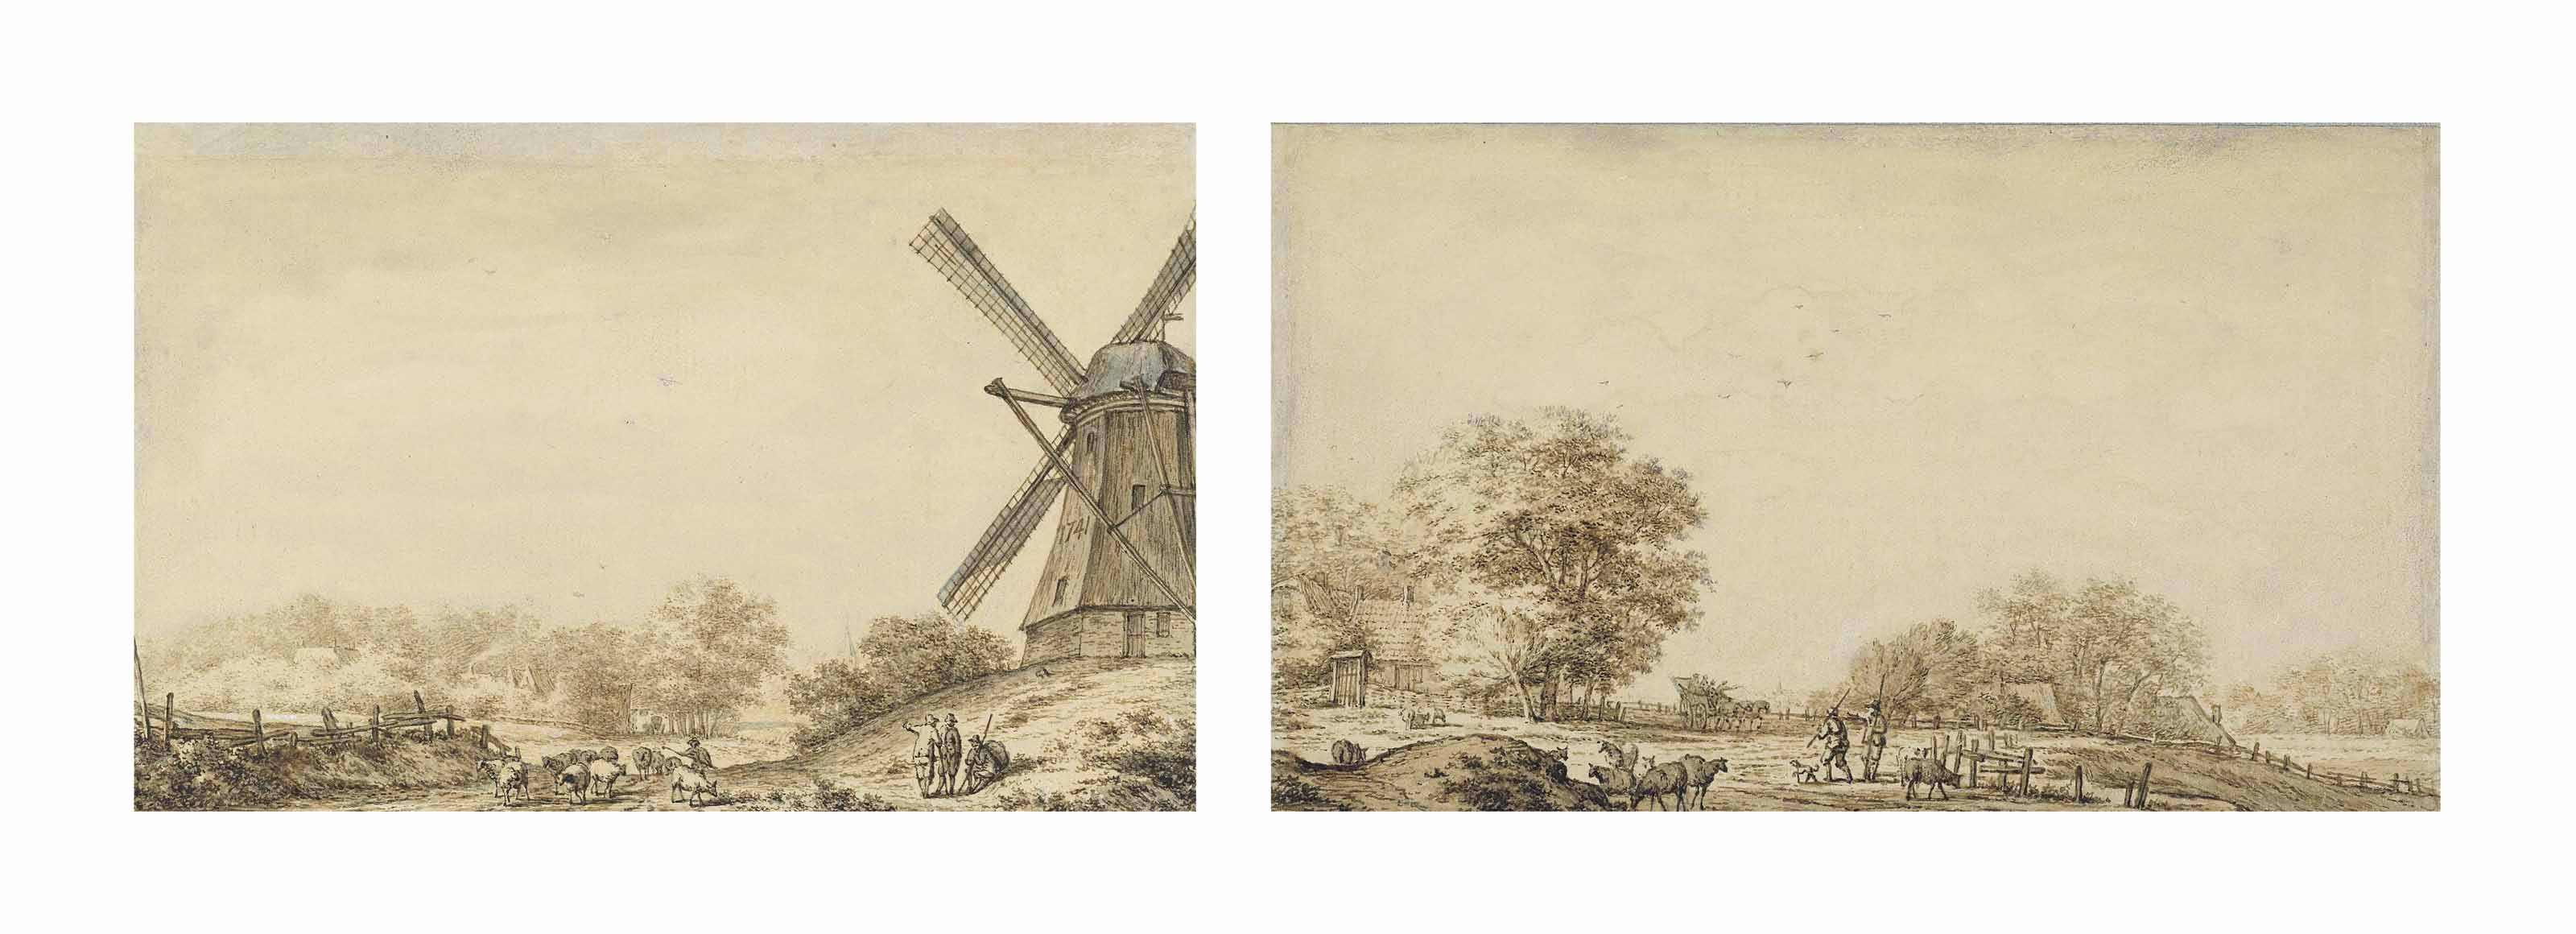 Jacob Cats (Altona 1741-1799 Amsterdam)